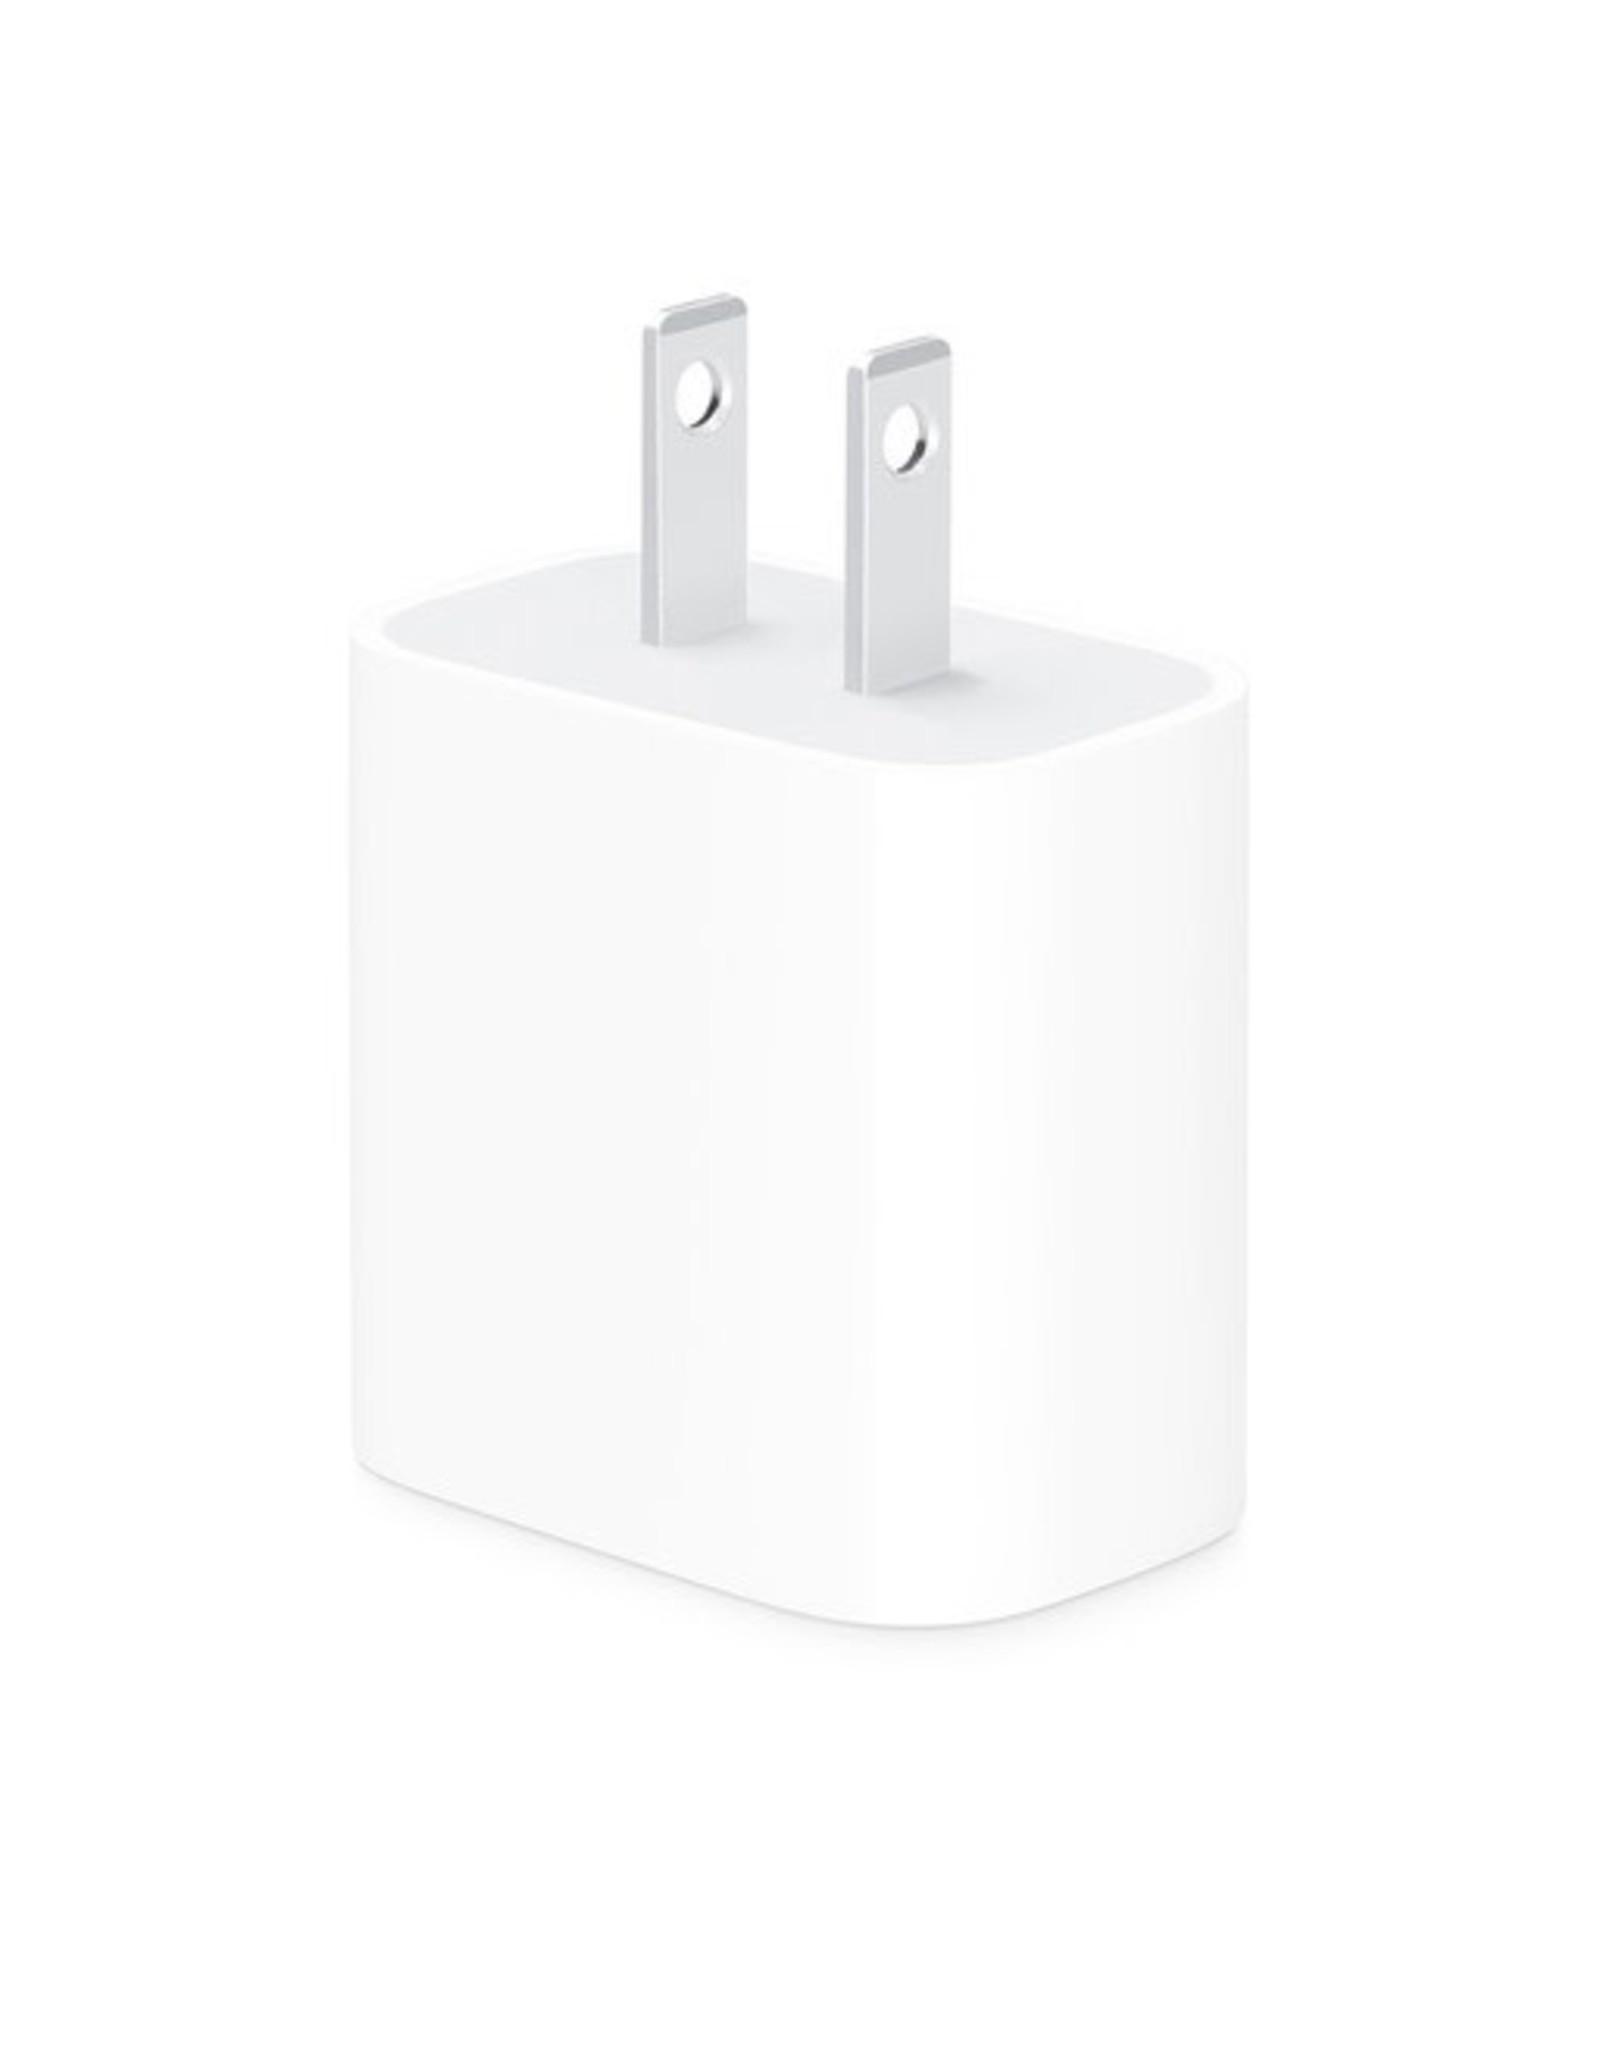 Apple Inst. 18W USB-C Power Adapter